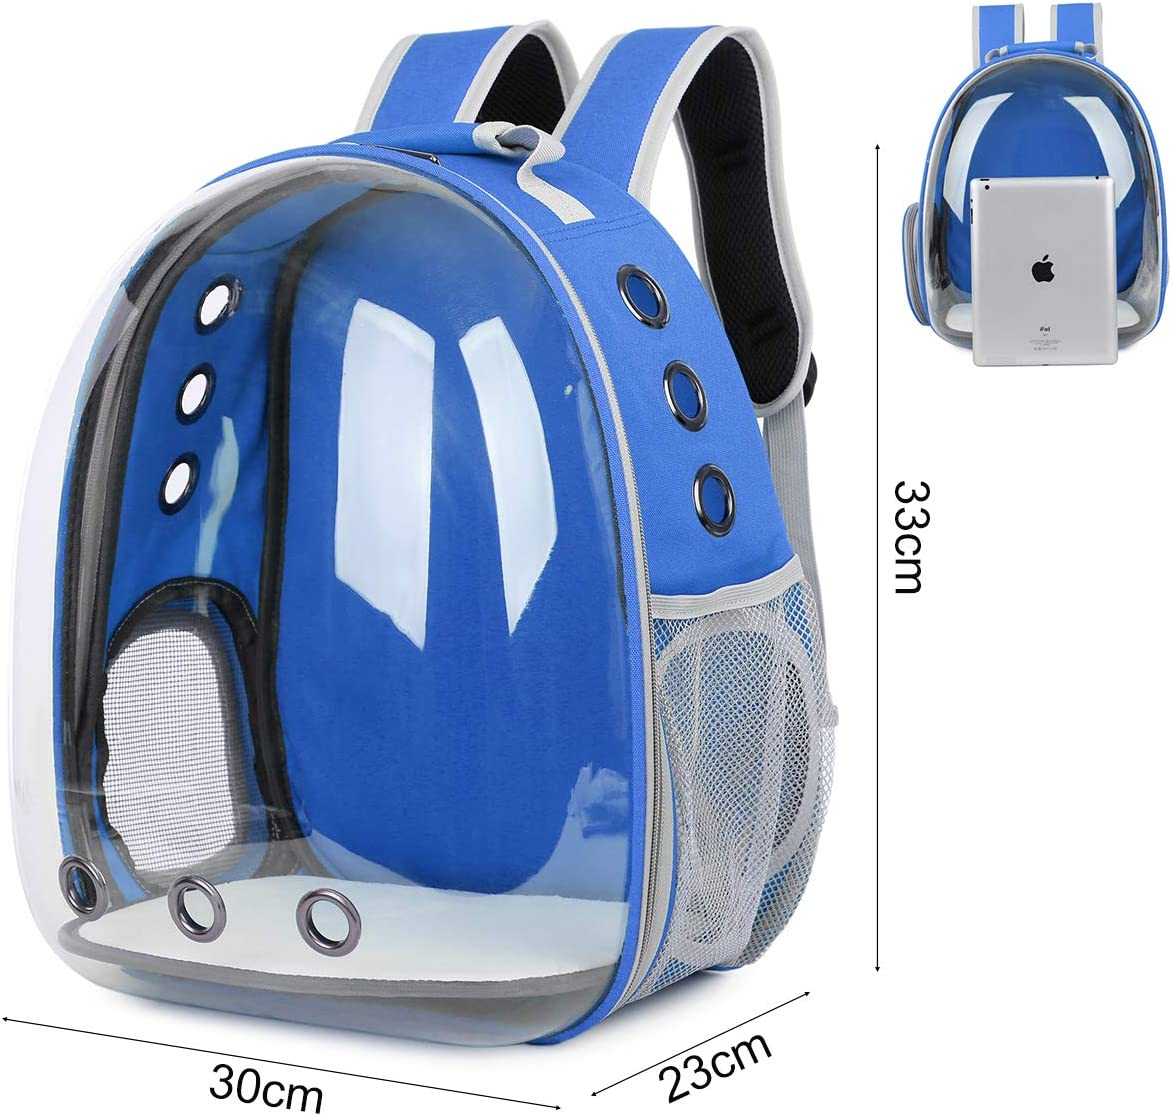 Mochila con c/ápsula de Burbujas para Exteriores port/átil Azul Bolsa Espacial Transpirable Transparente para Mascotas YiYa Bolsa de Transporte para Gatos para Perros